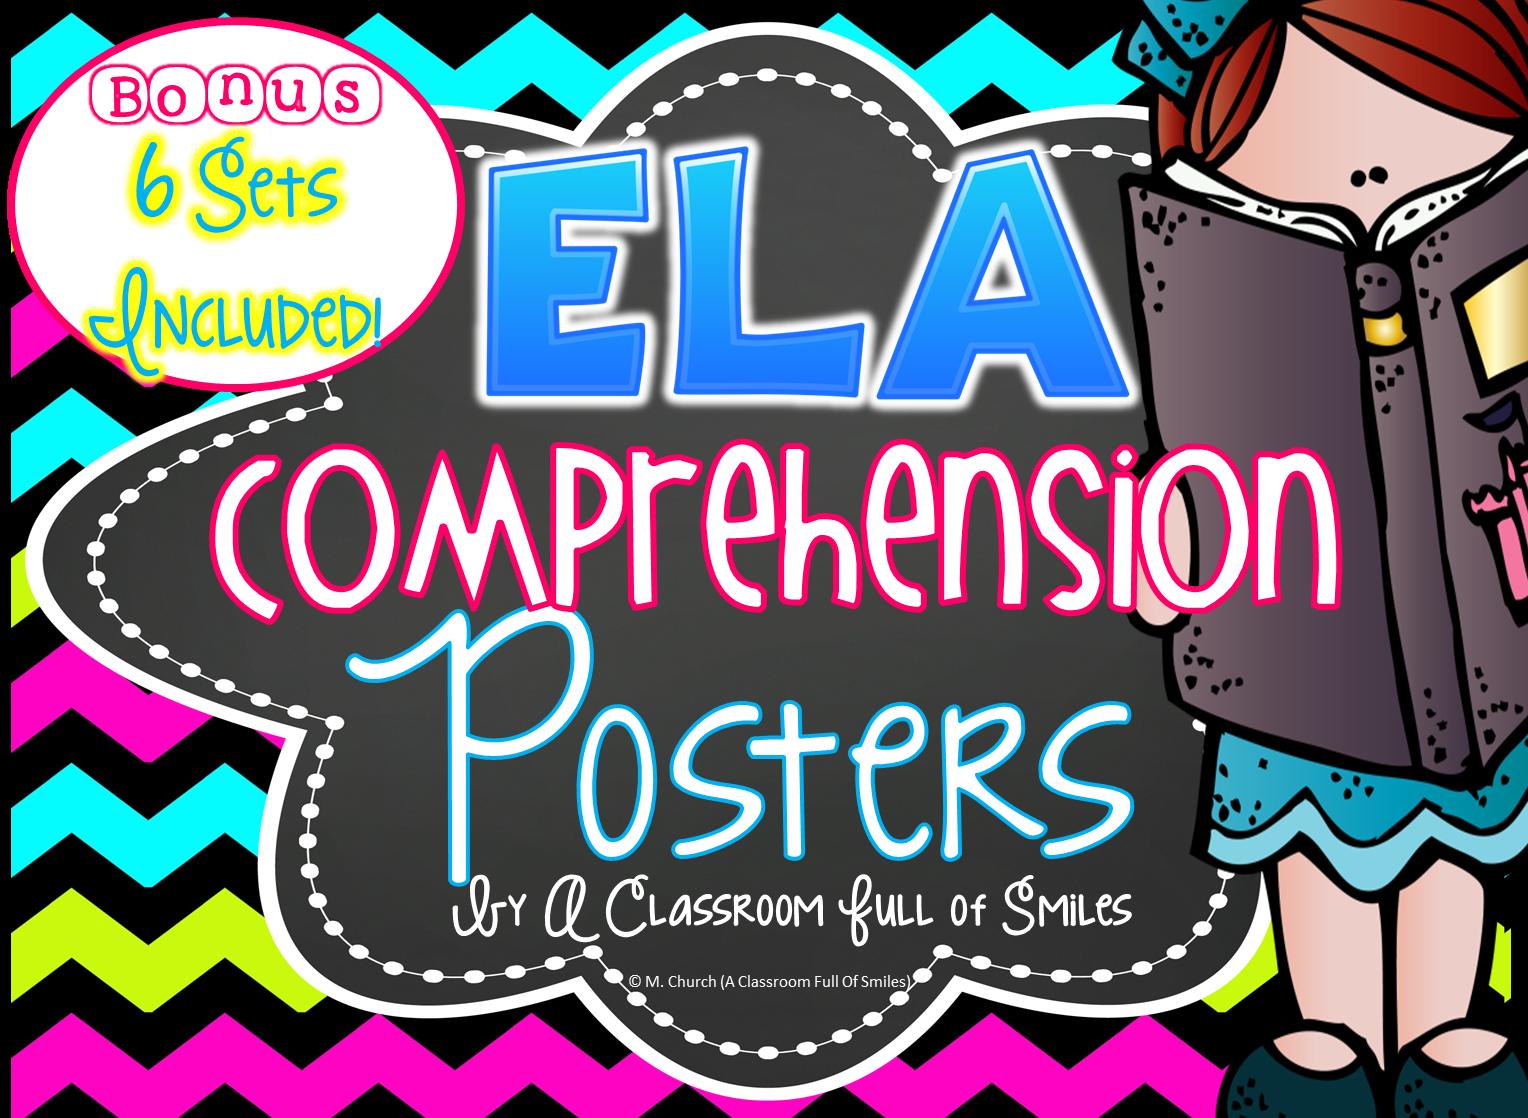 https://www.teacherspayteachers.com/Product/Reading-Comprehension-Posters-Bonus-6-Sets-Included-1256566